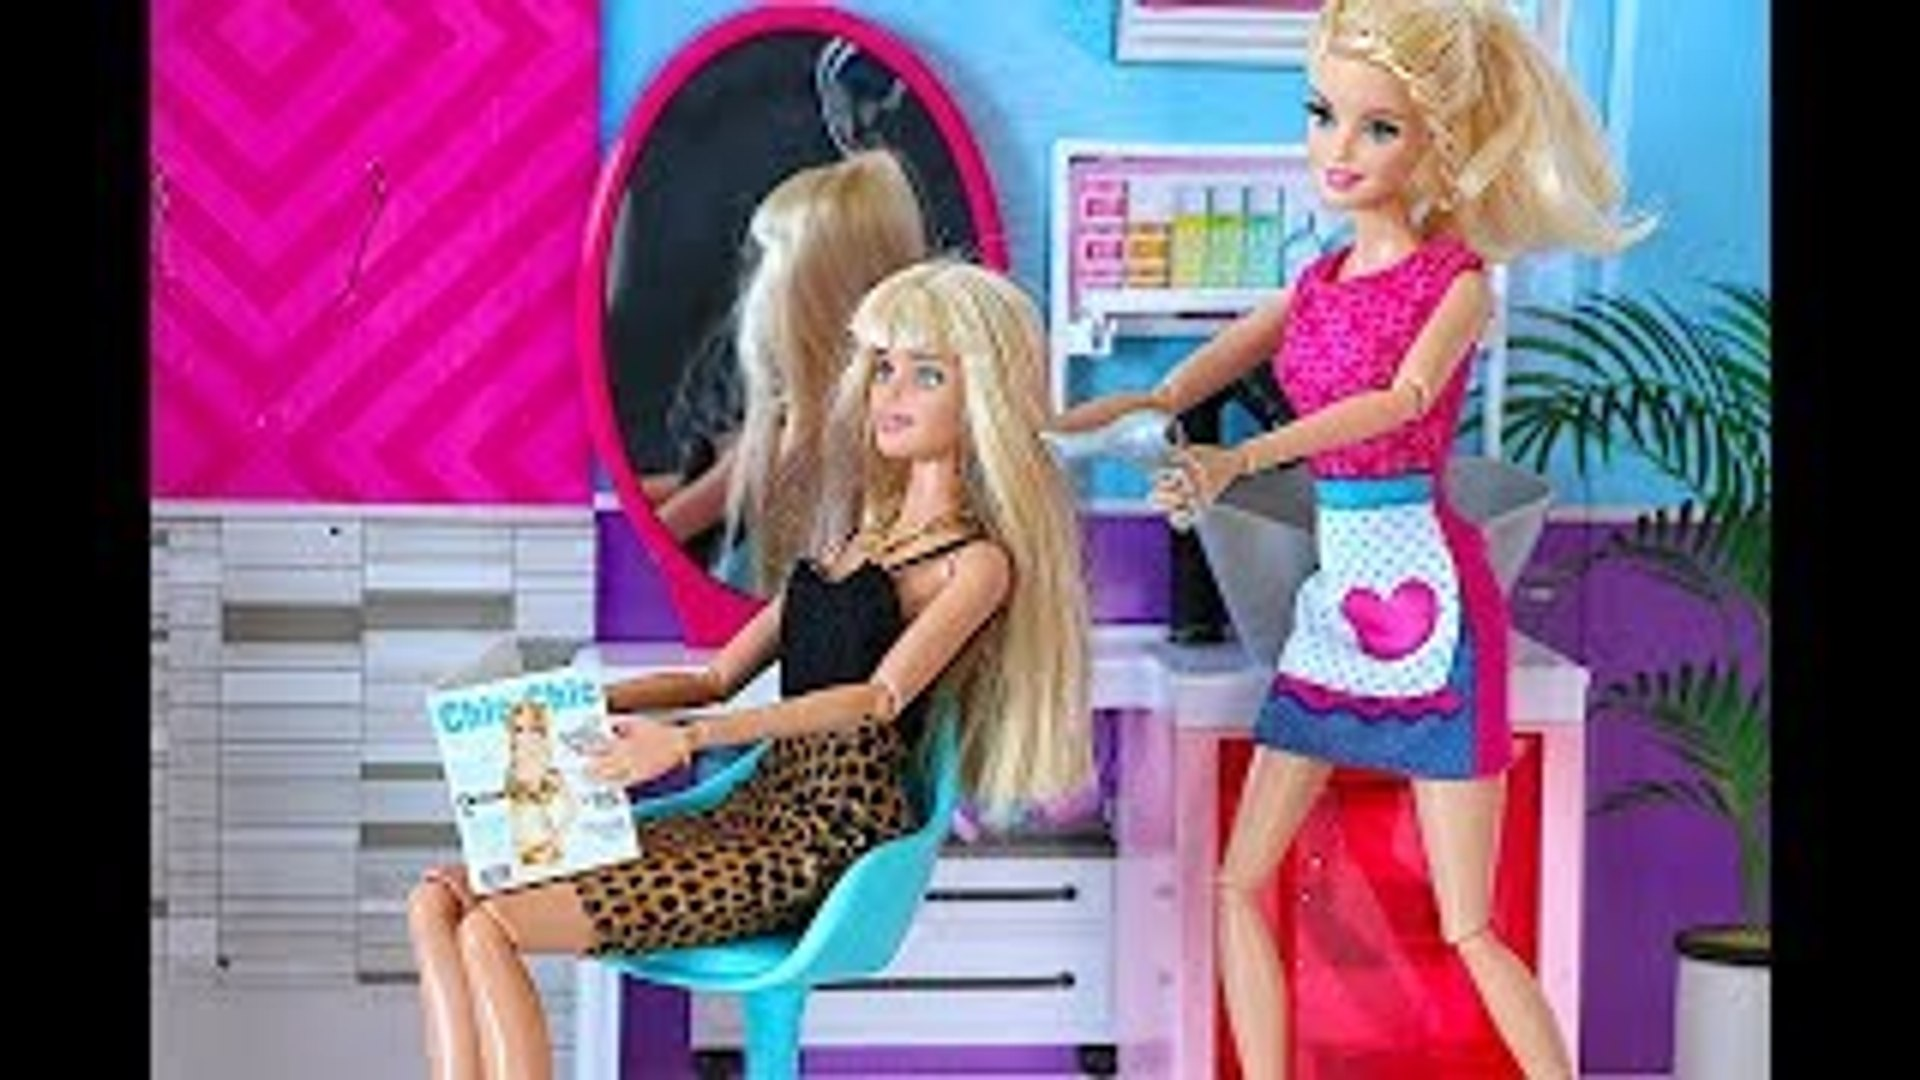 Barbie Doll Hair Style Salon - Playing baby doll DYI Hair Cut Toys